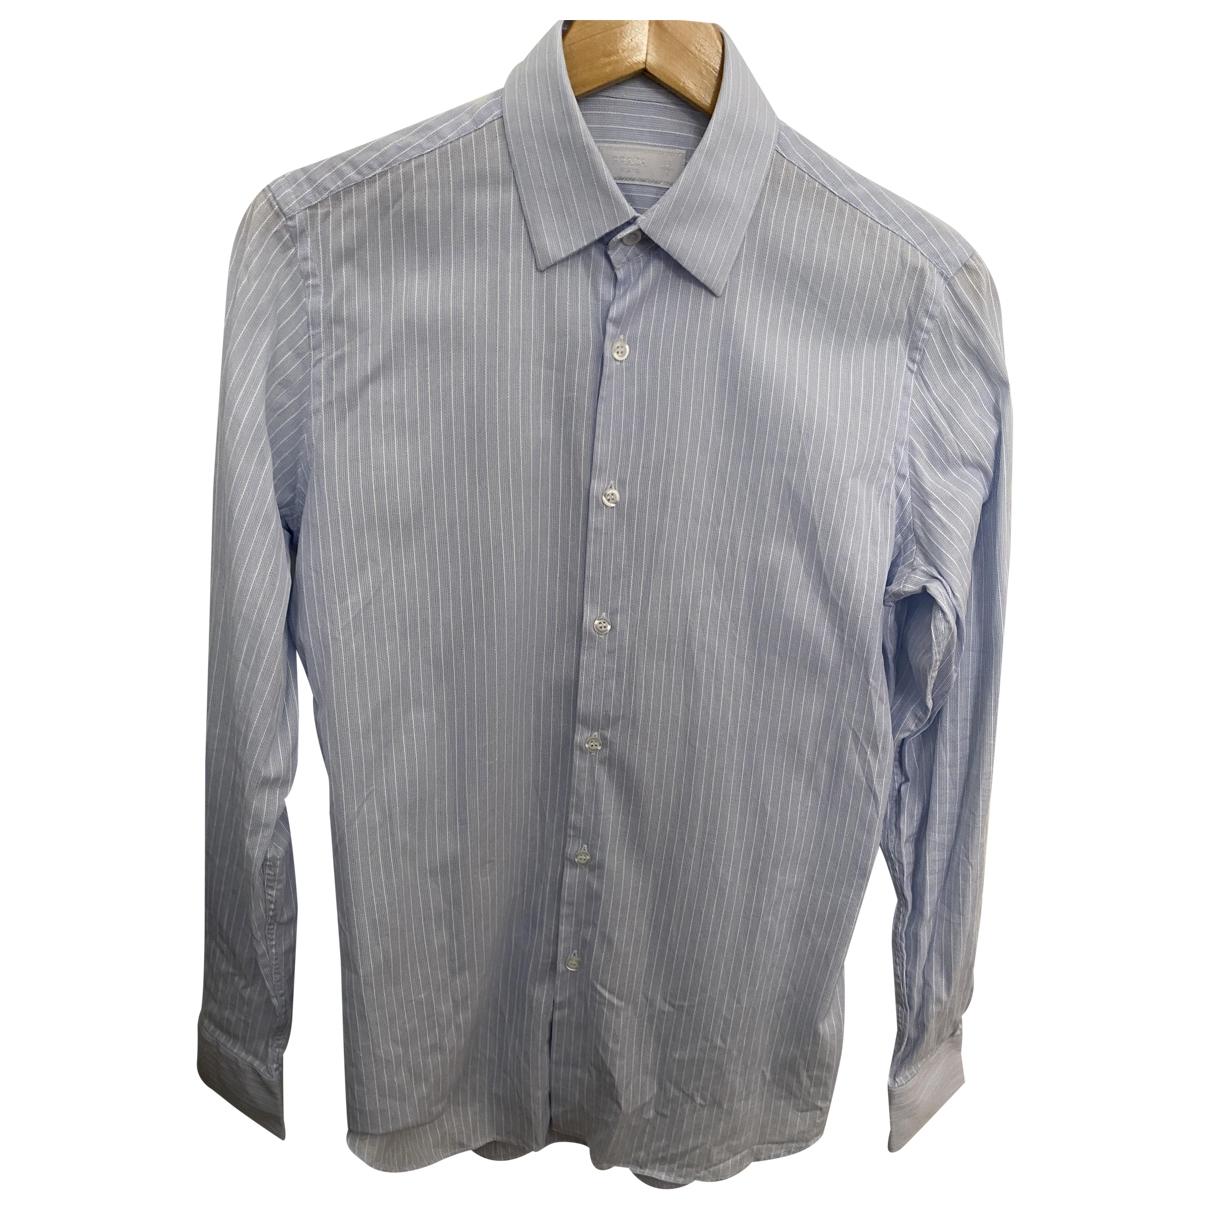 Prada \N Blue Cotton Shirts for Men 38 EU (tour de cou / collar)